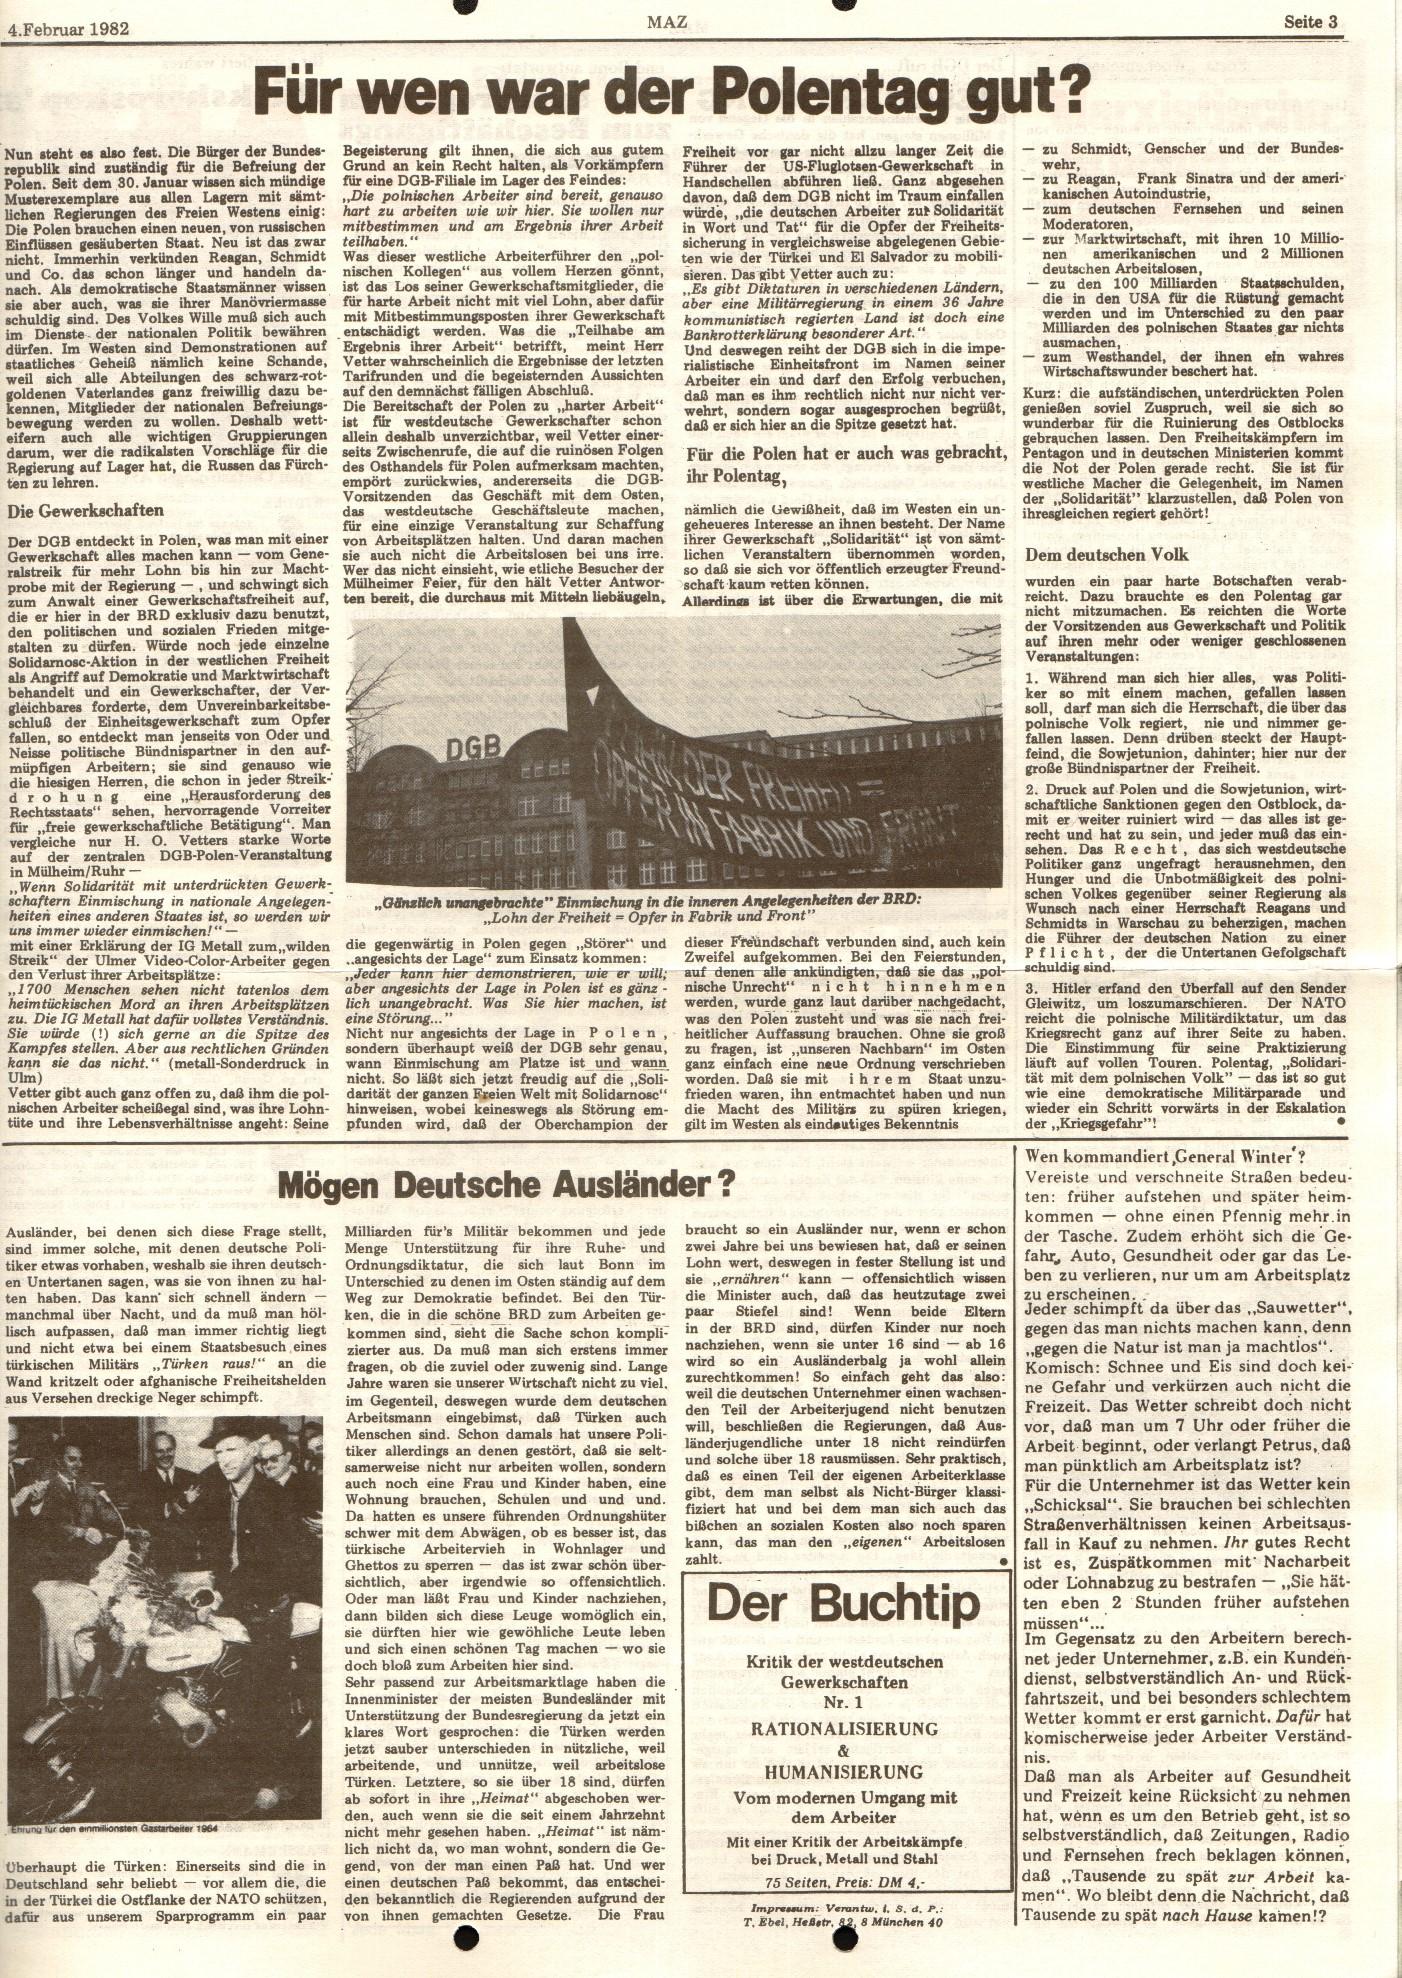 Hamburg_MG_MAZ_Druck_19820204_03